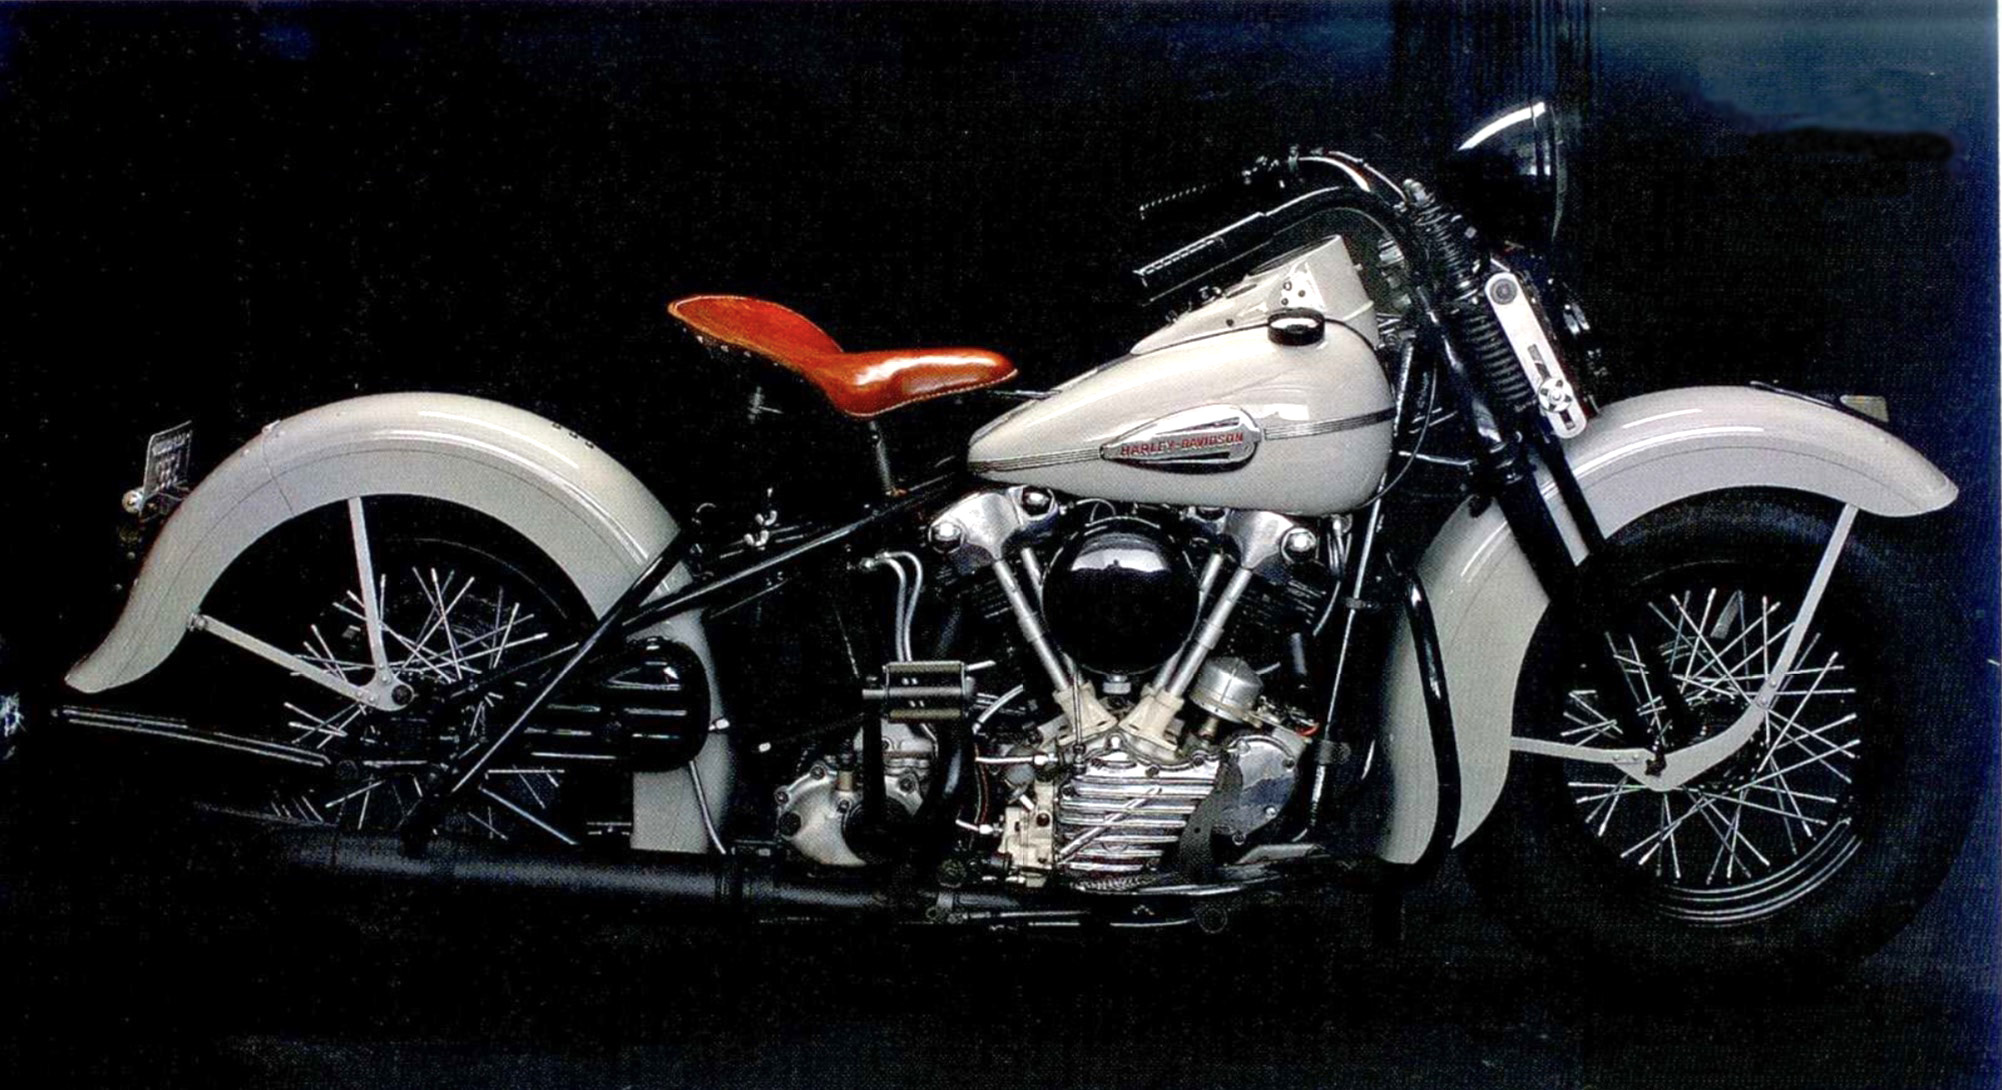 Modelo FL de 1943